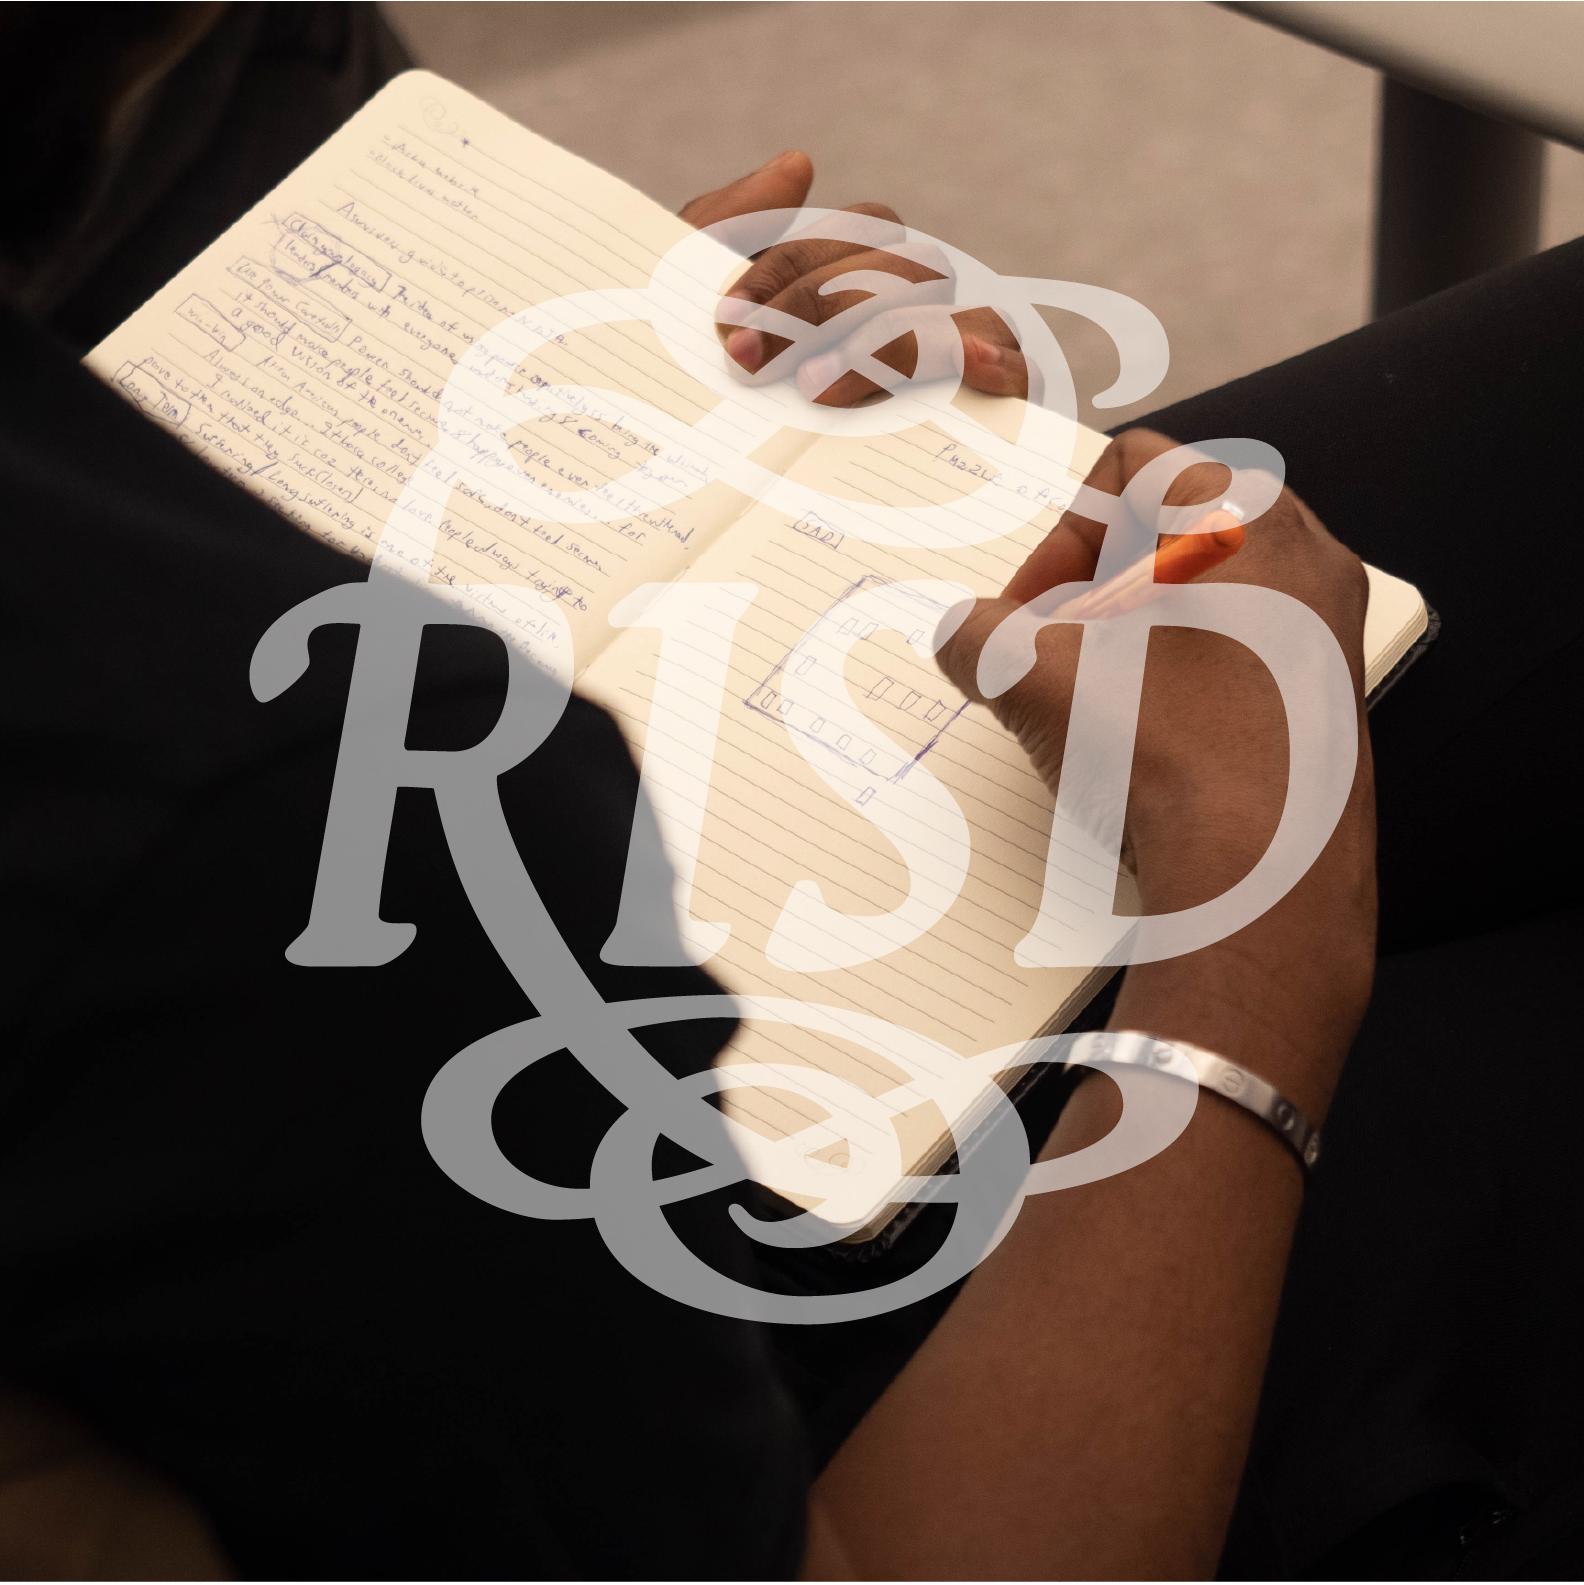 RISD+SANKOFA PARTNERSHIP — sankofa org